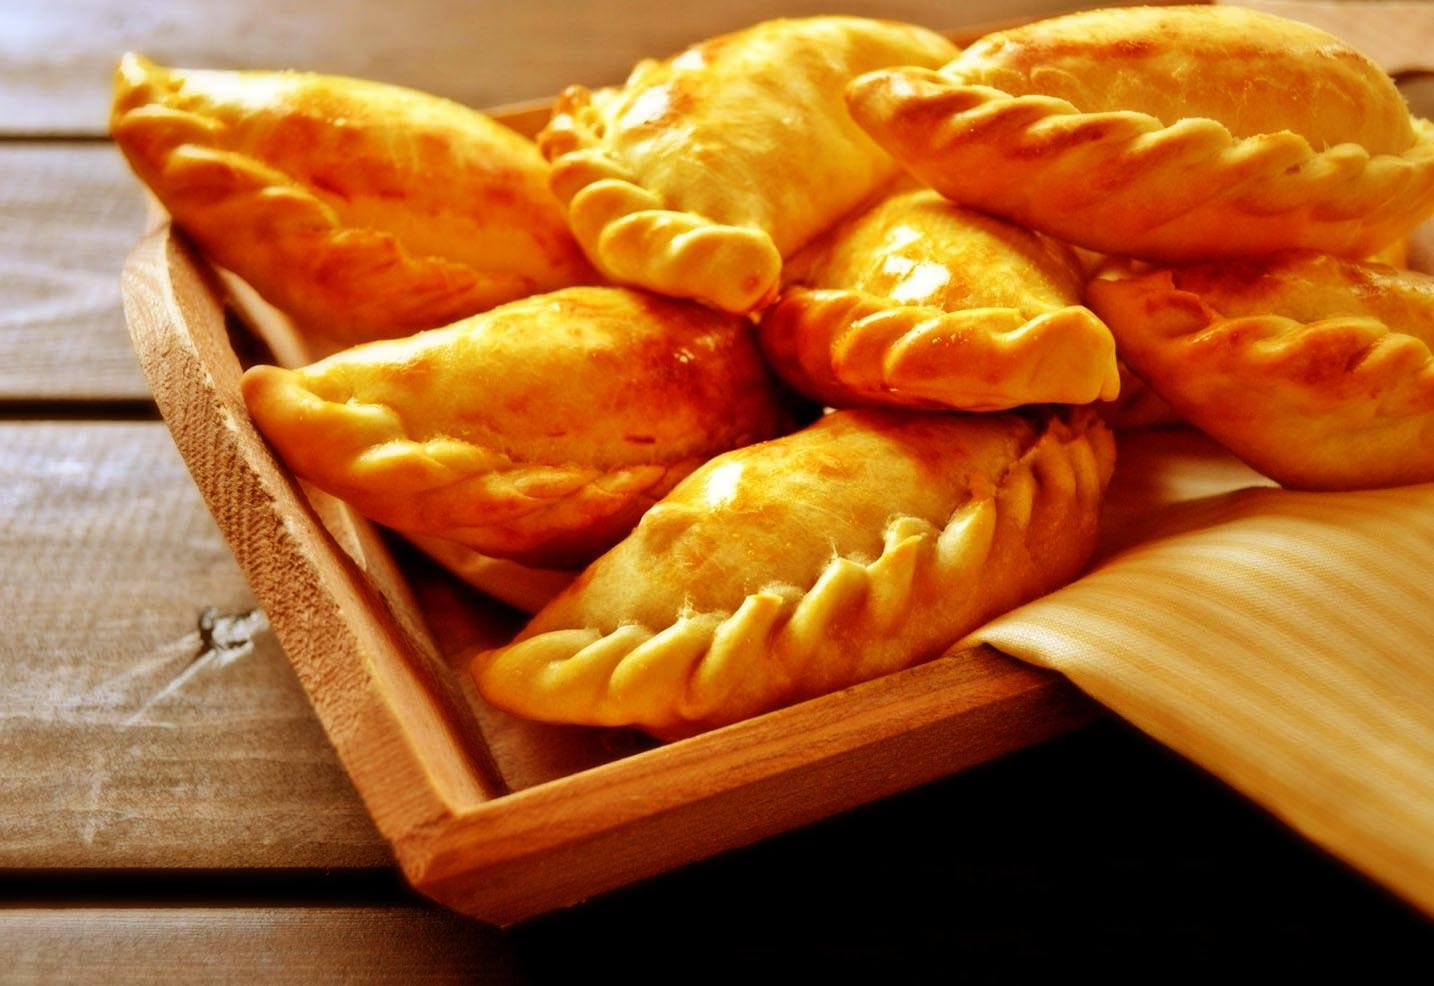 Les empanadas arts et voyages for Art et cuisine tahiti